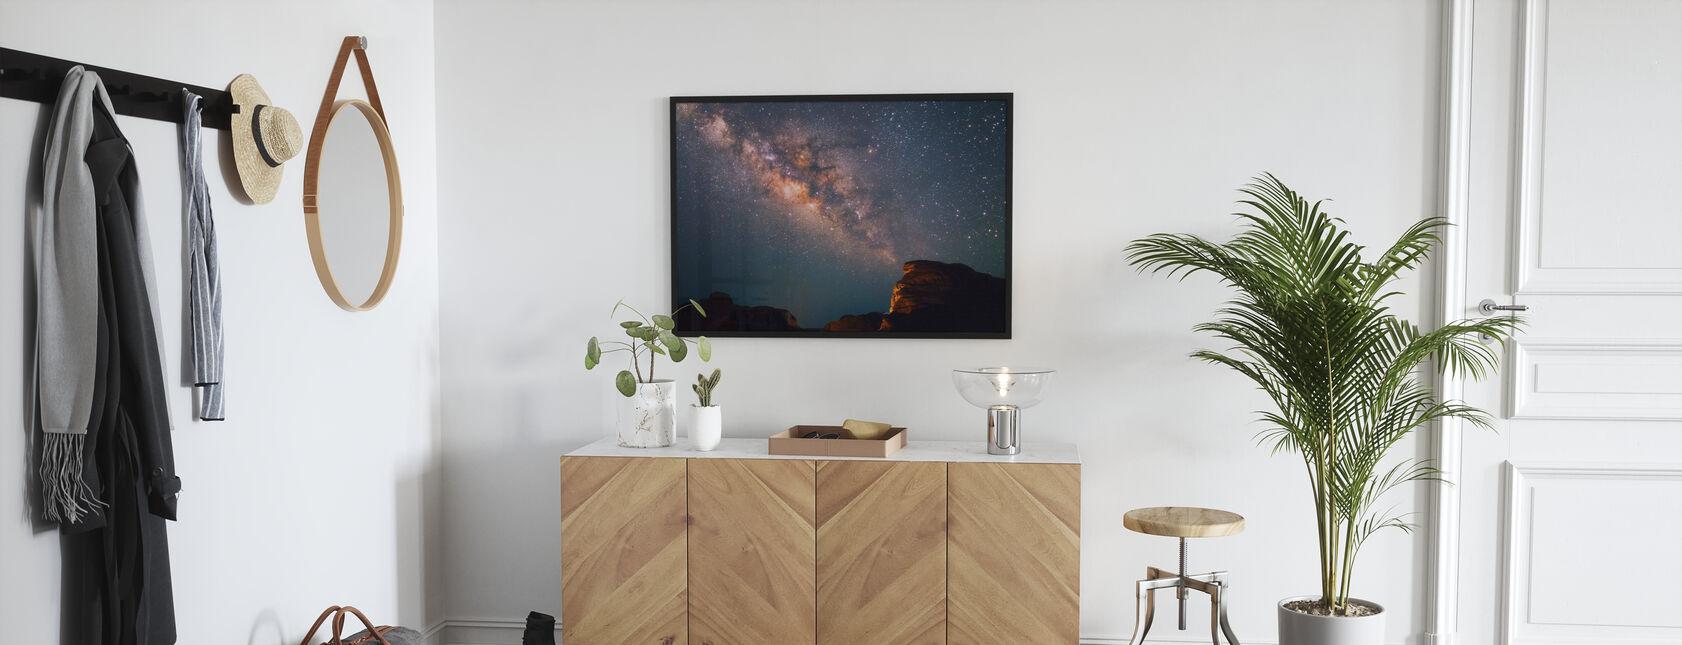 Stjärnor ovanför Grand Canyon - Inramad tavla - Hall